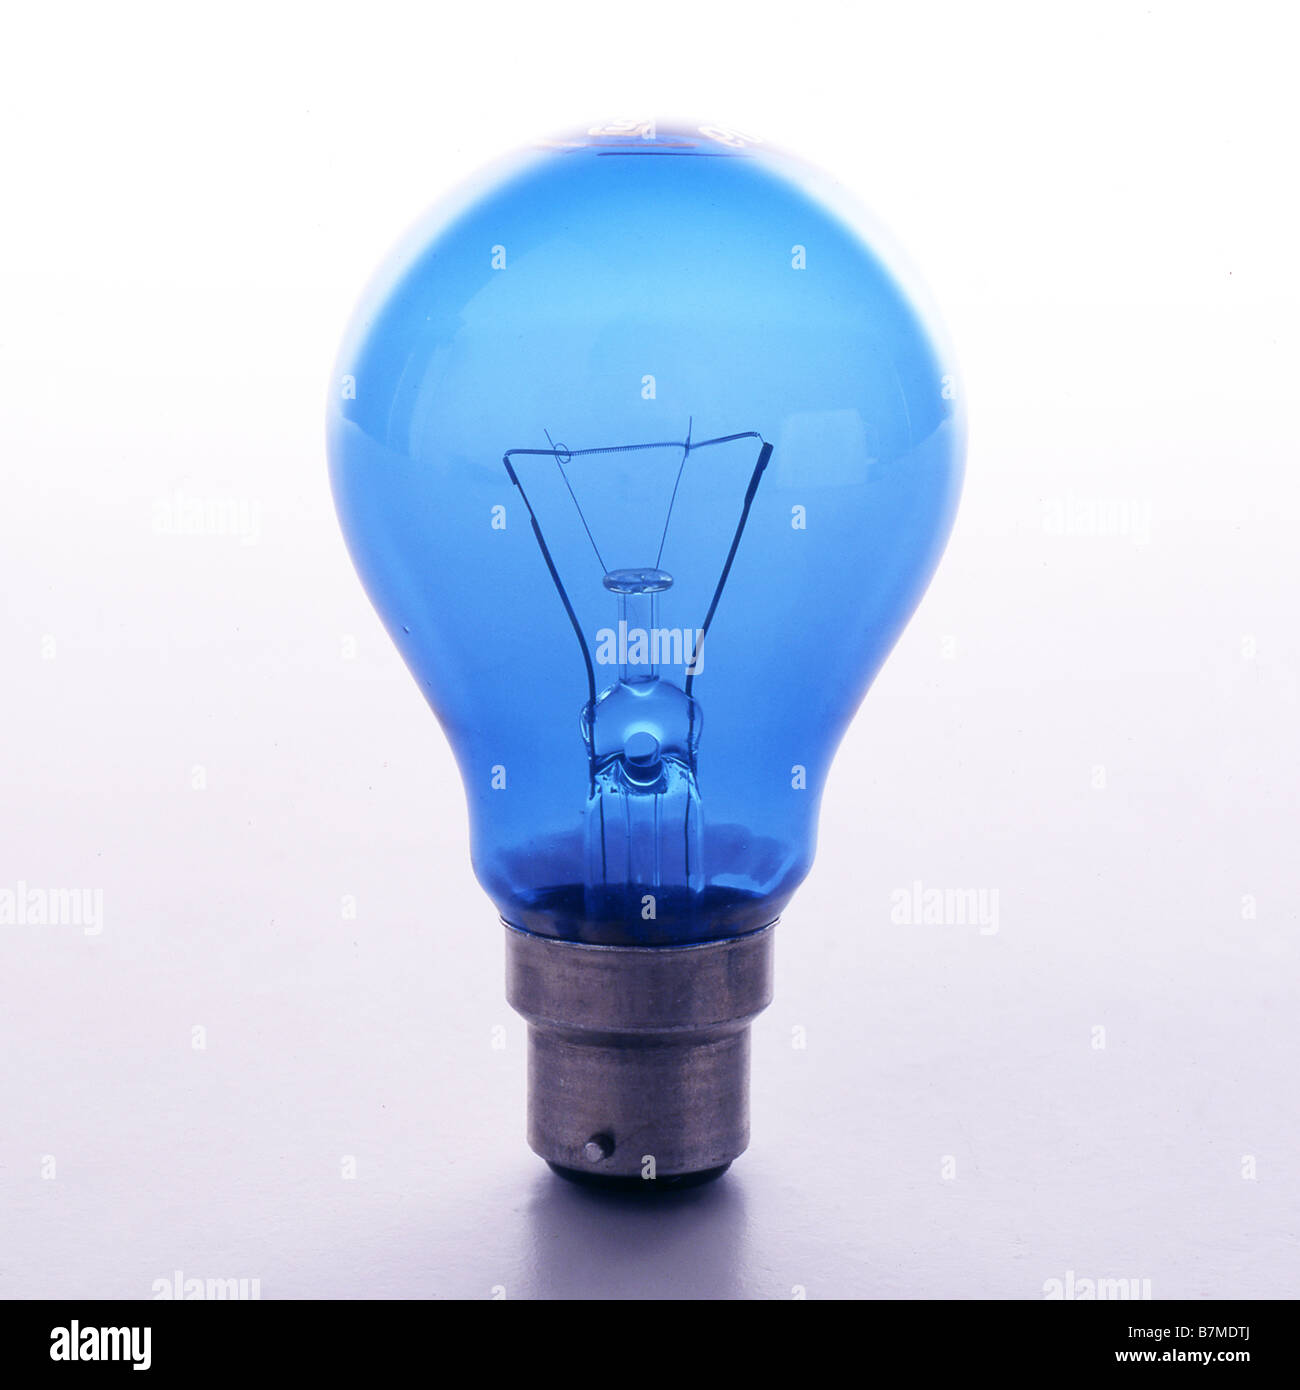 Tungsten lightbulb - Stock Image